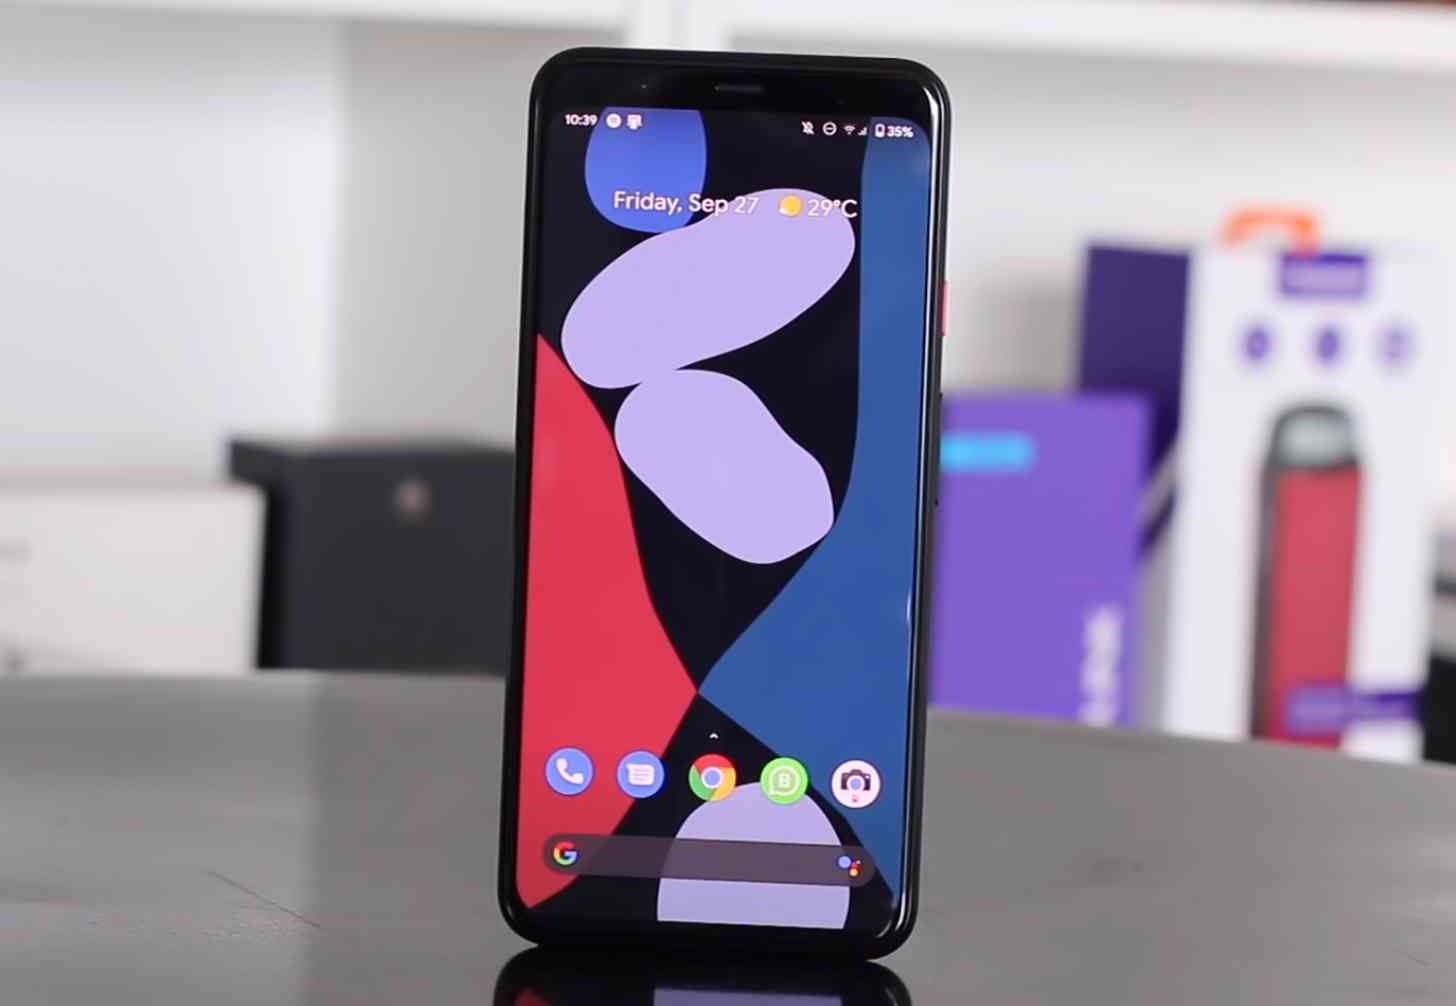 Google's Pixel 4 XL